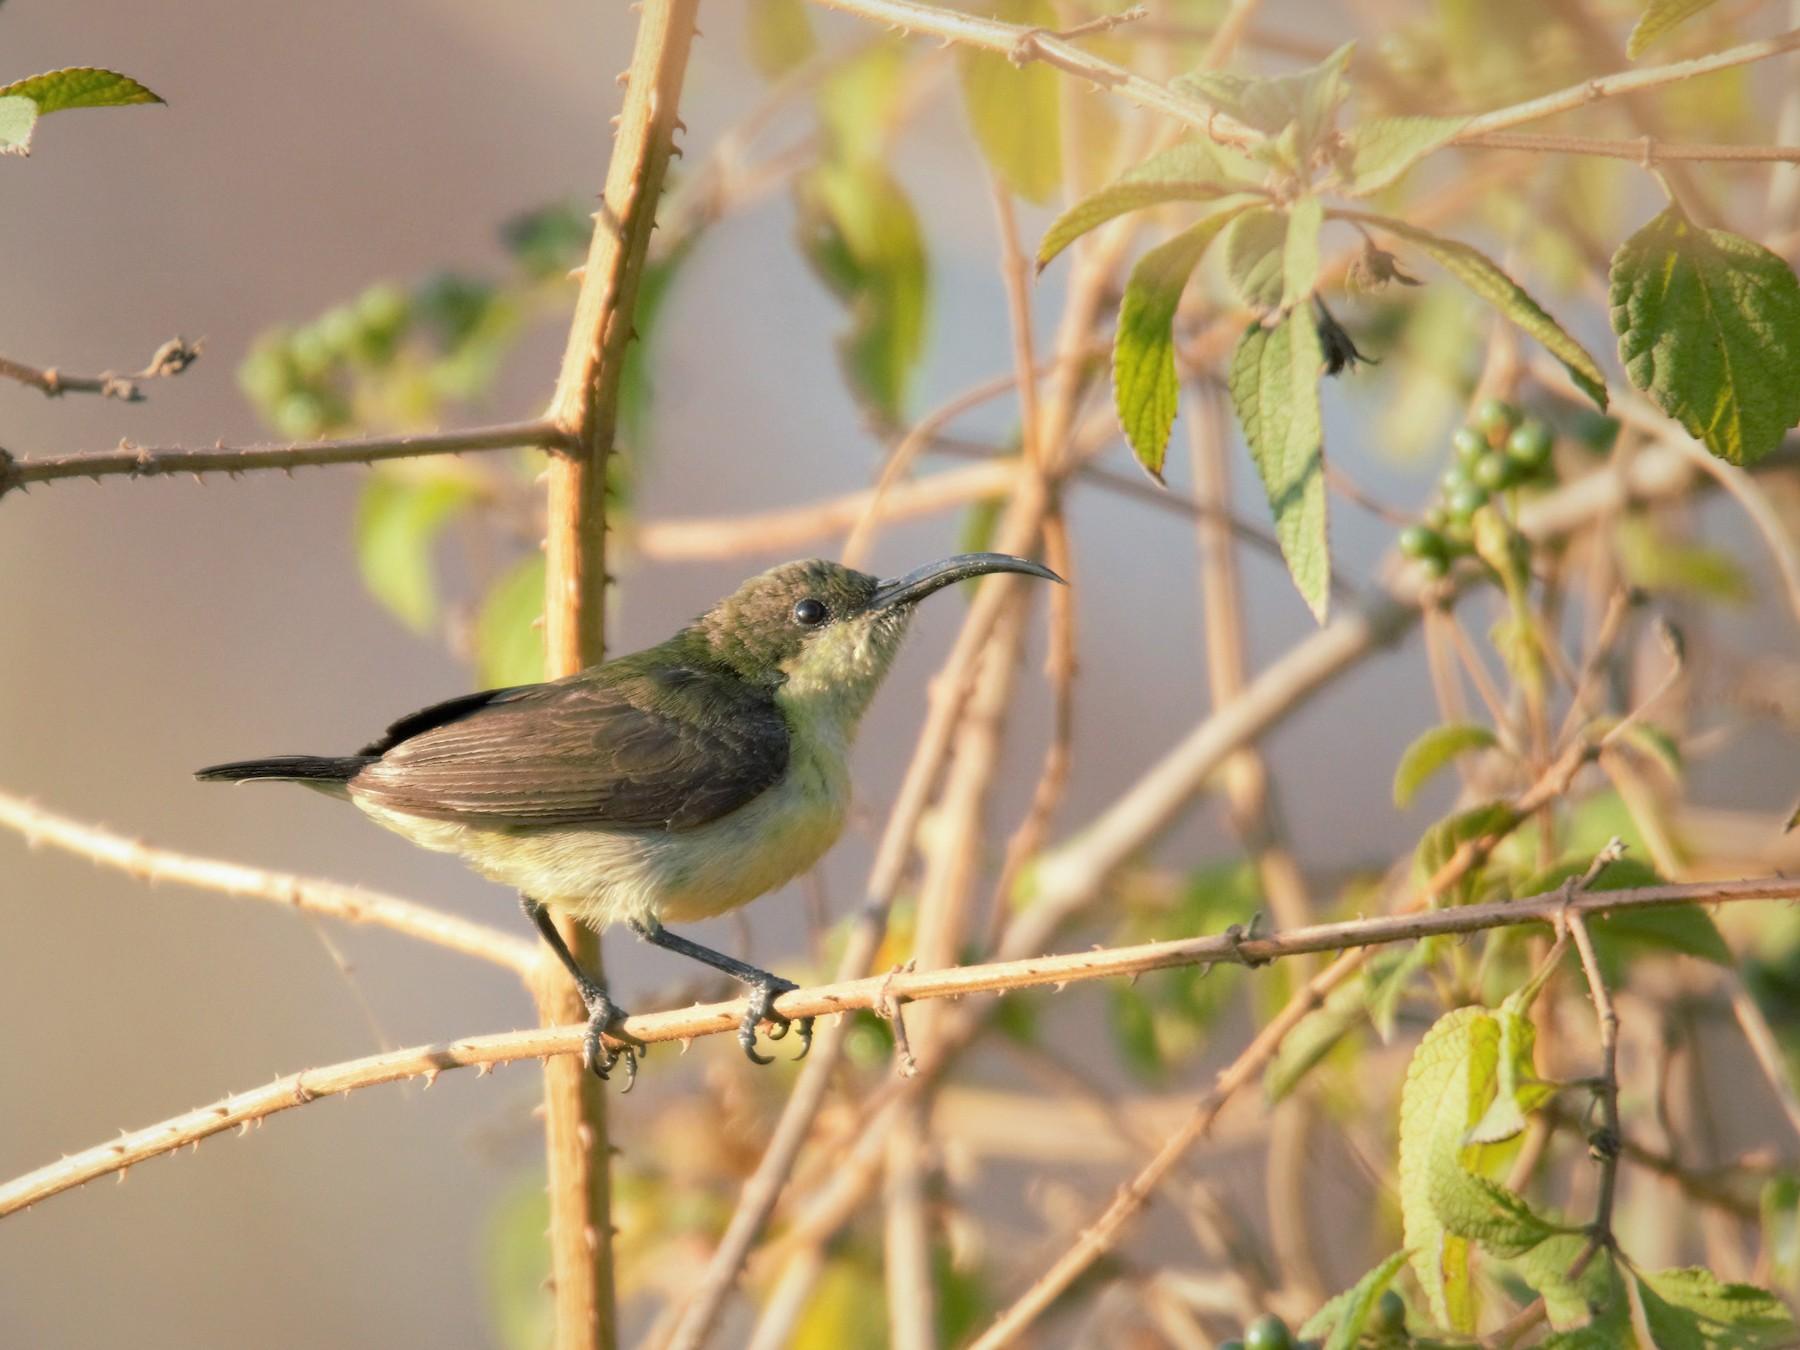 Loten's Sunbird - Prem Prakash Garg